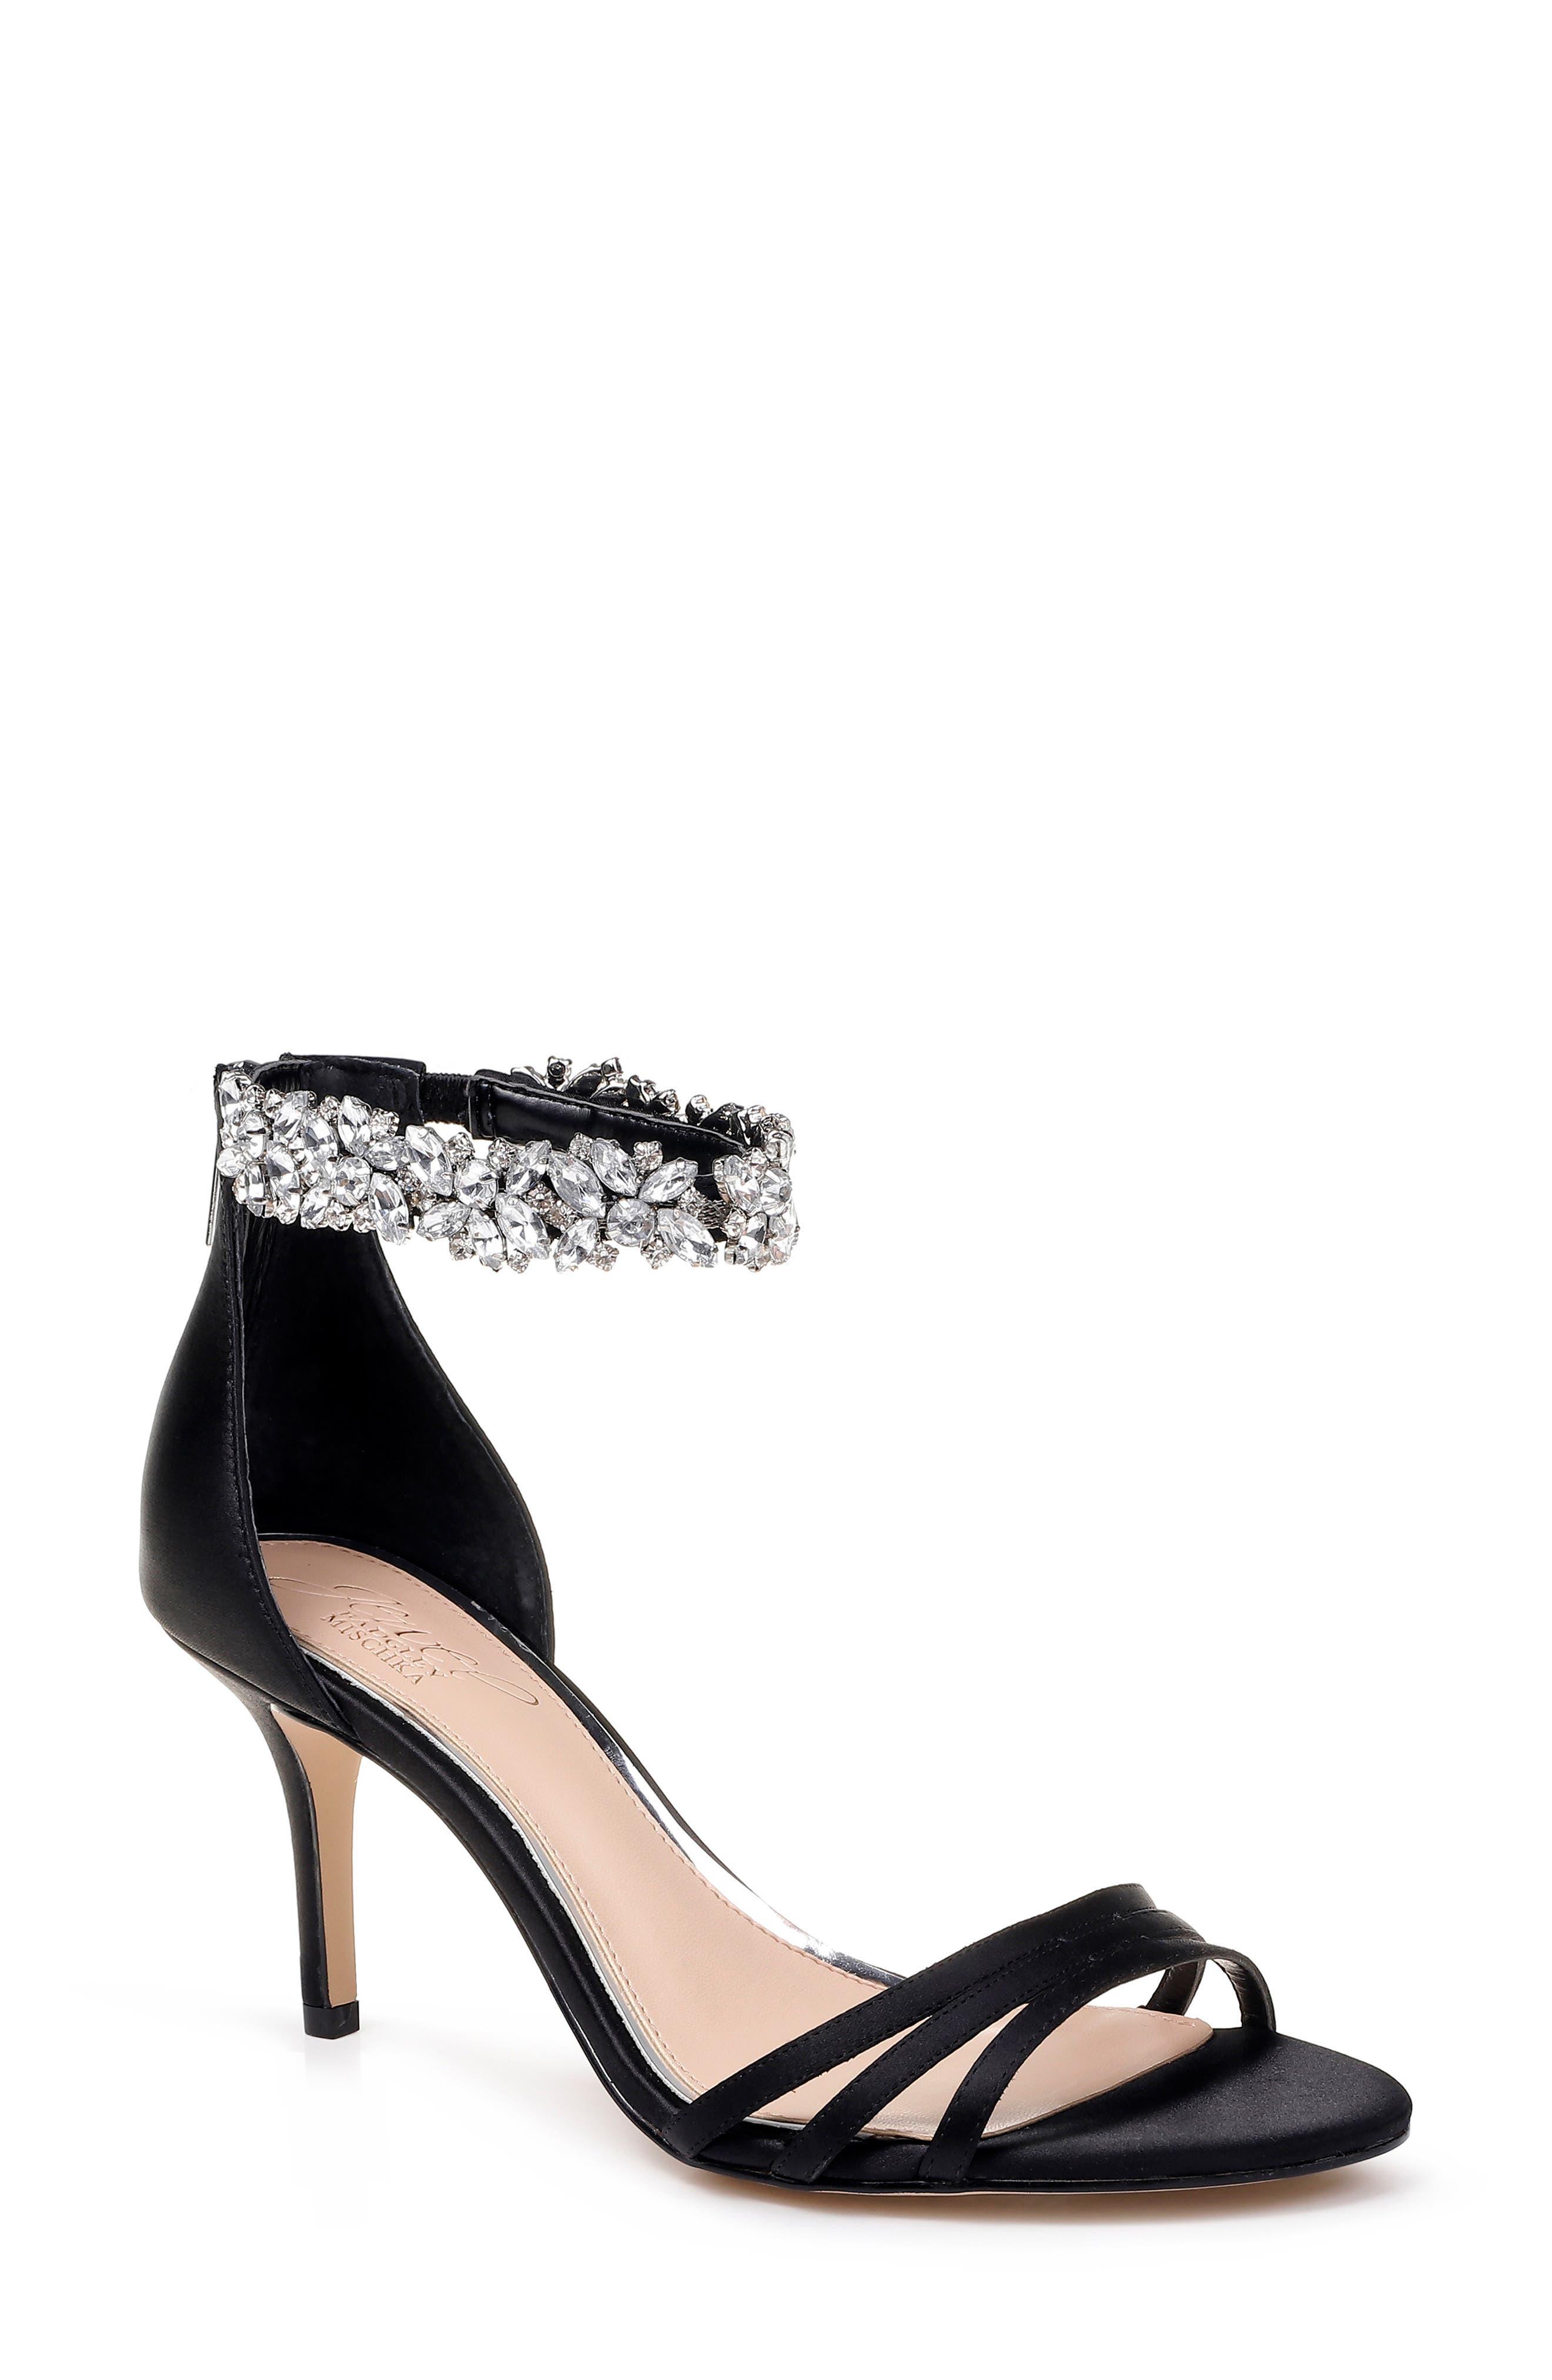 Jewel Badgley Mischka Zamora Ankle Strap Sandal, Black